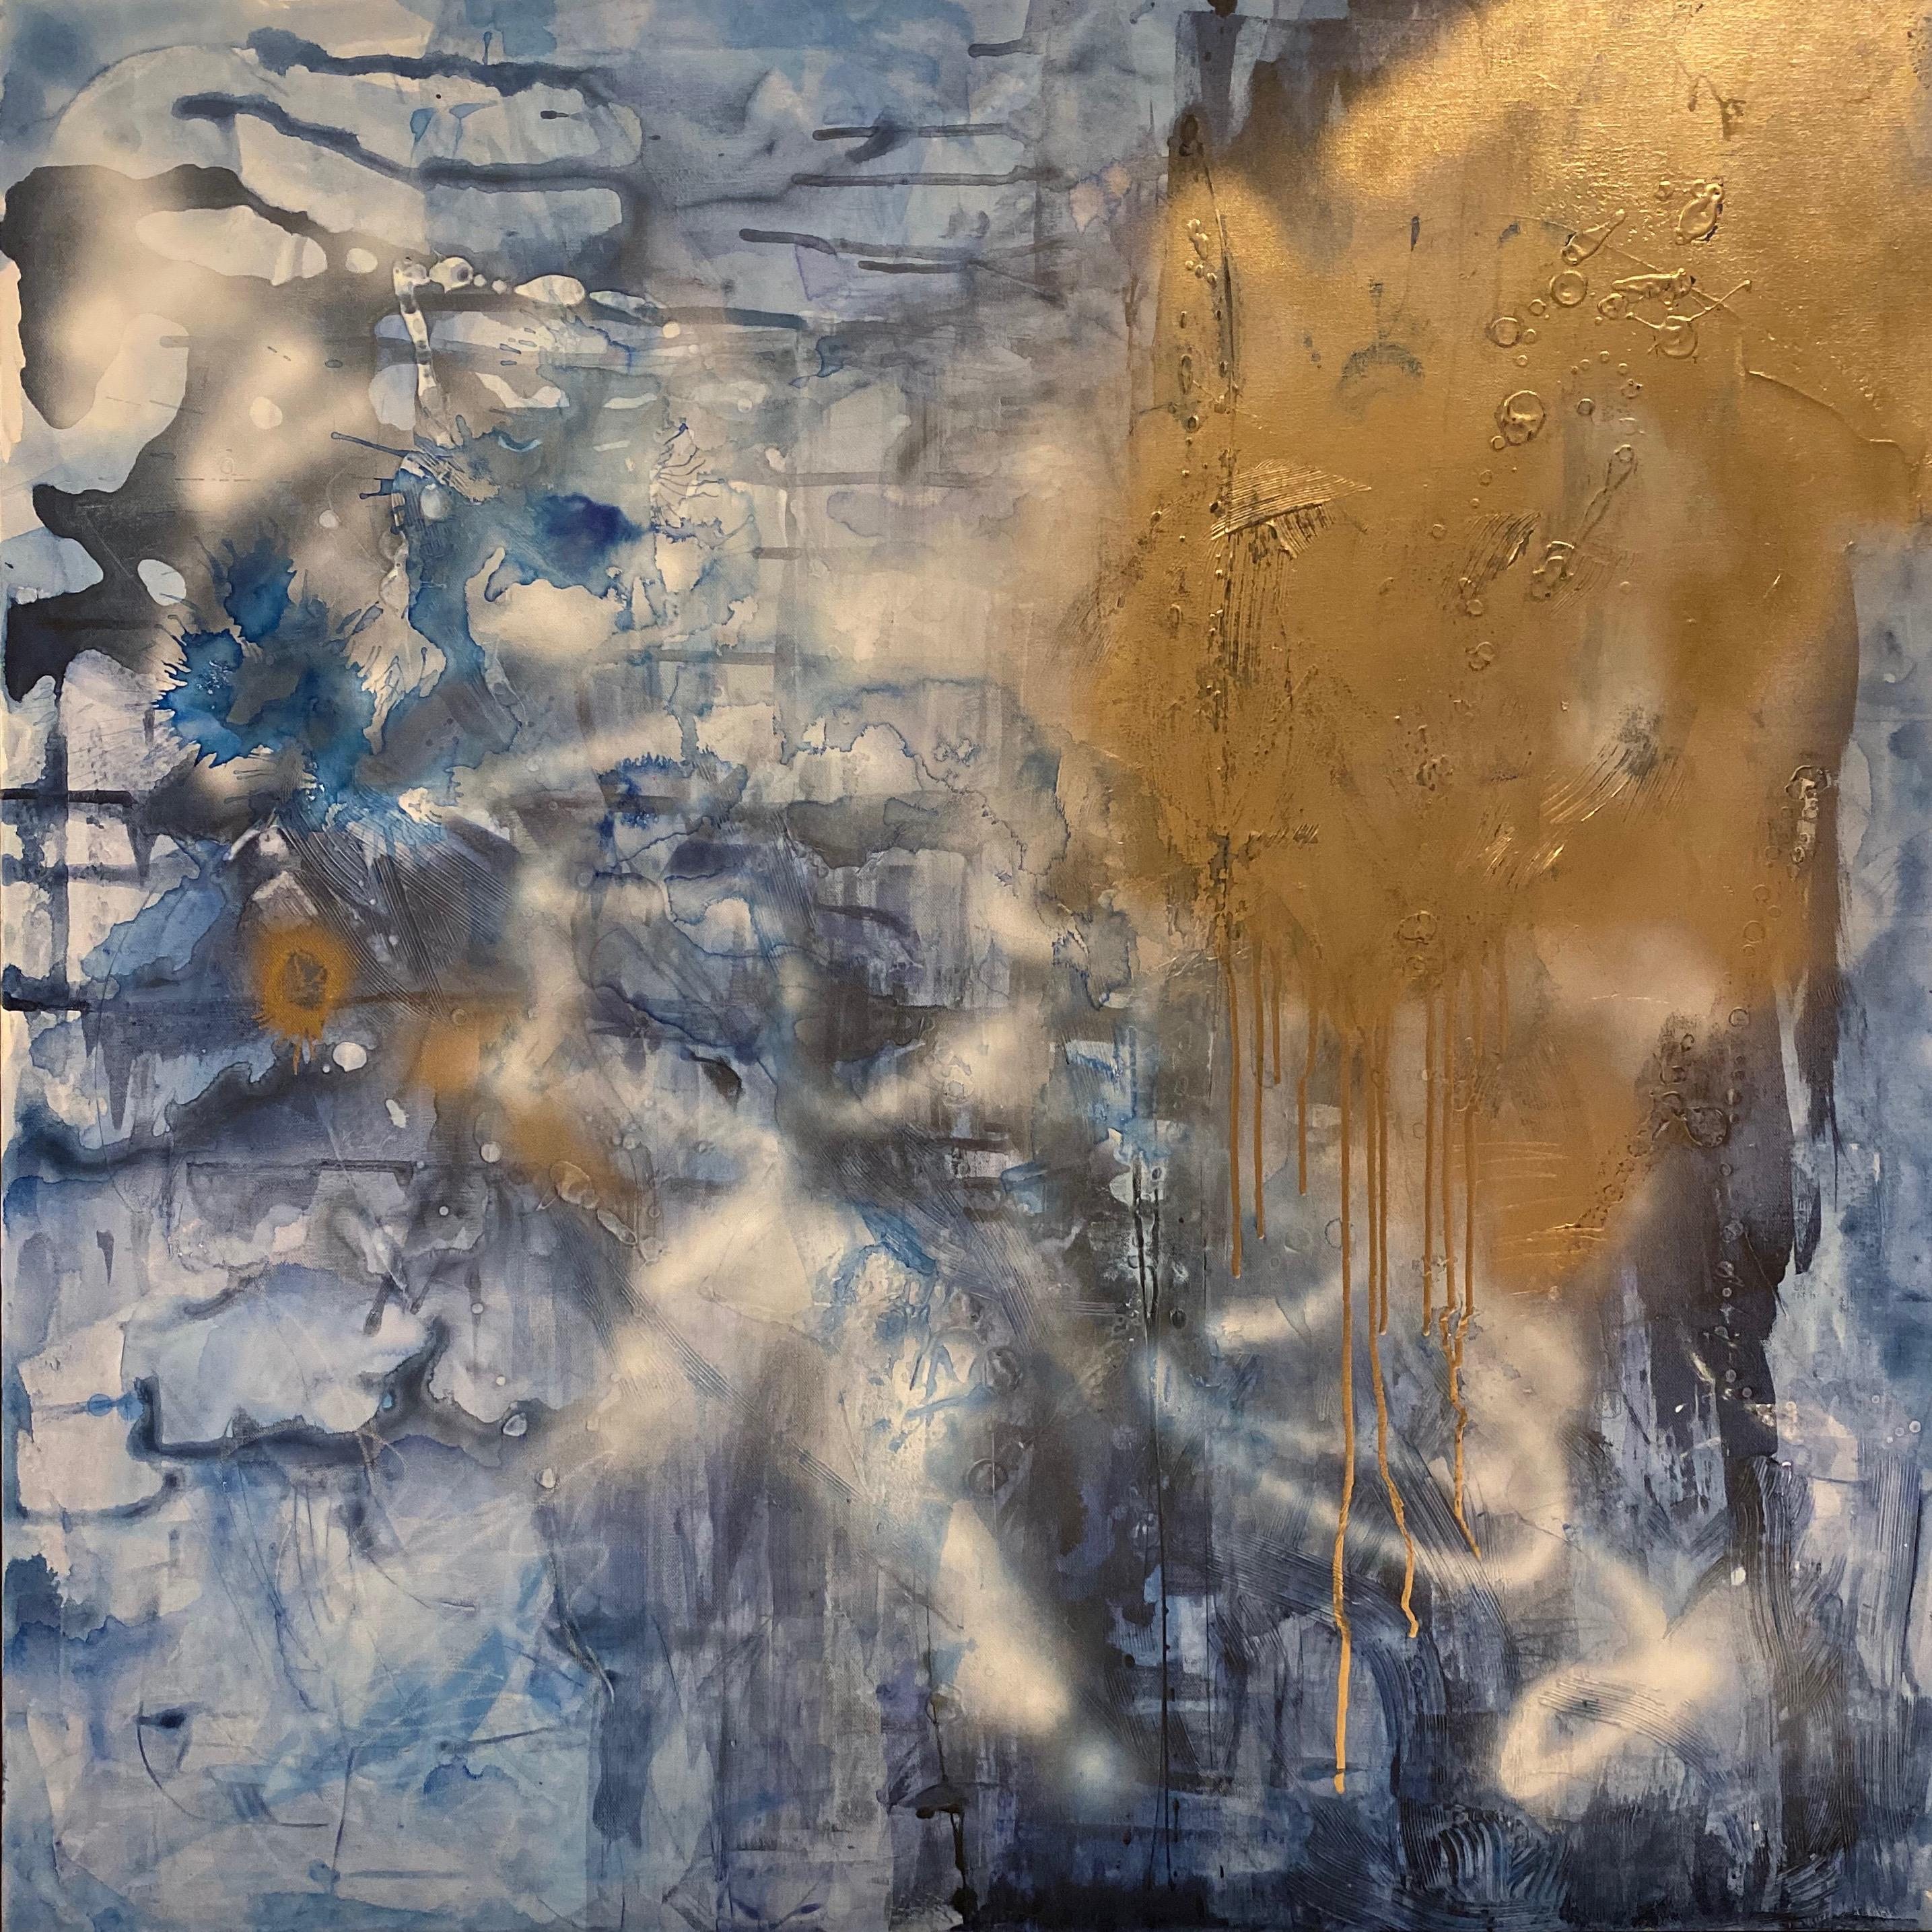 Suburban Vandal, 2020, Mixed Media on Canvas, Signed